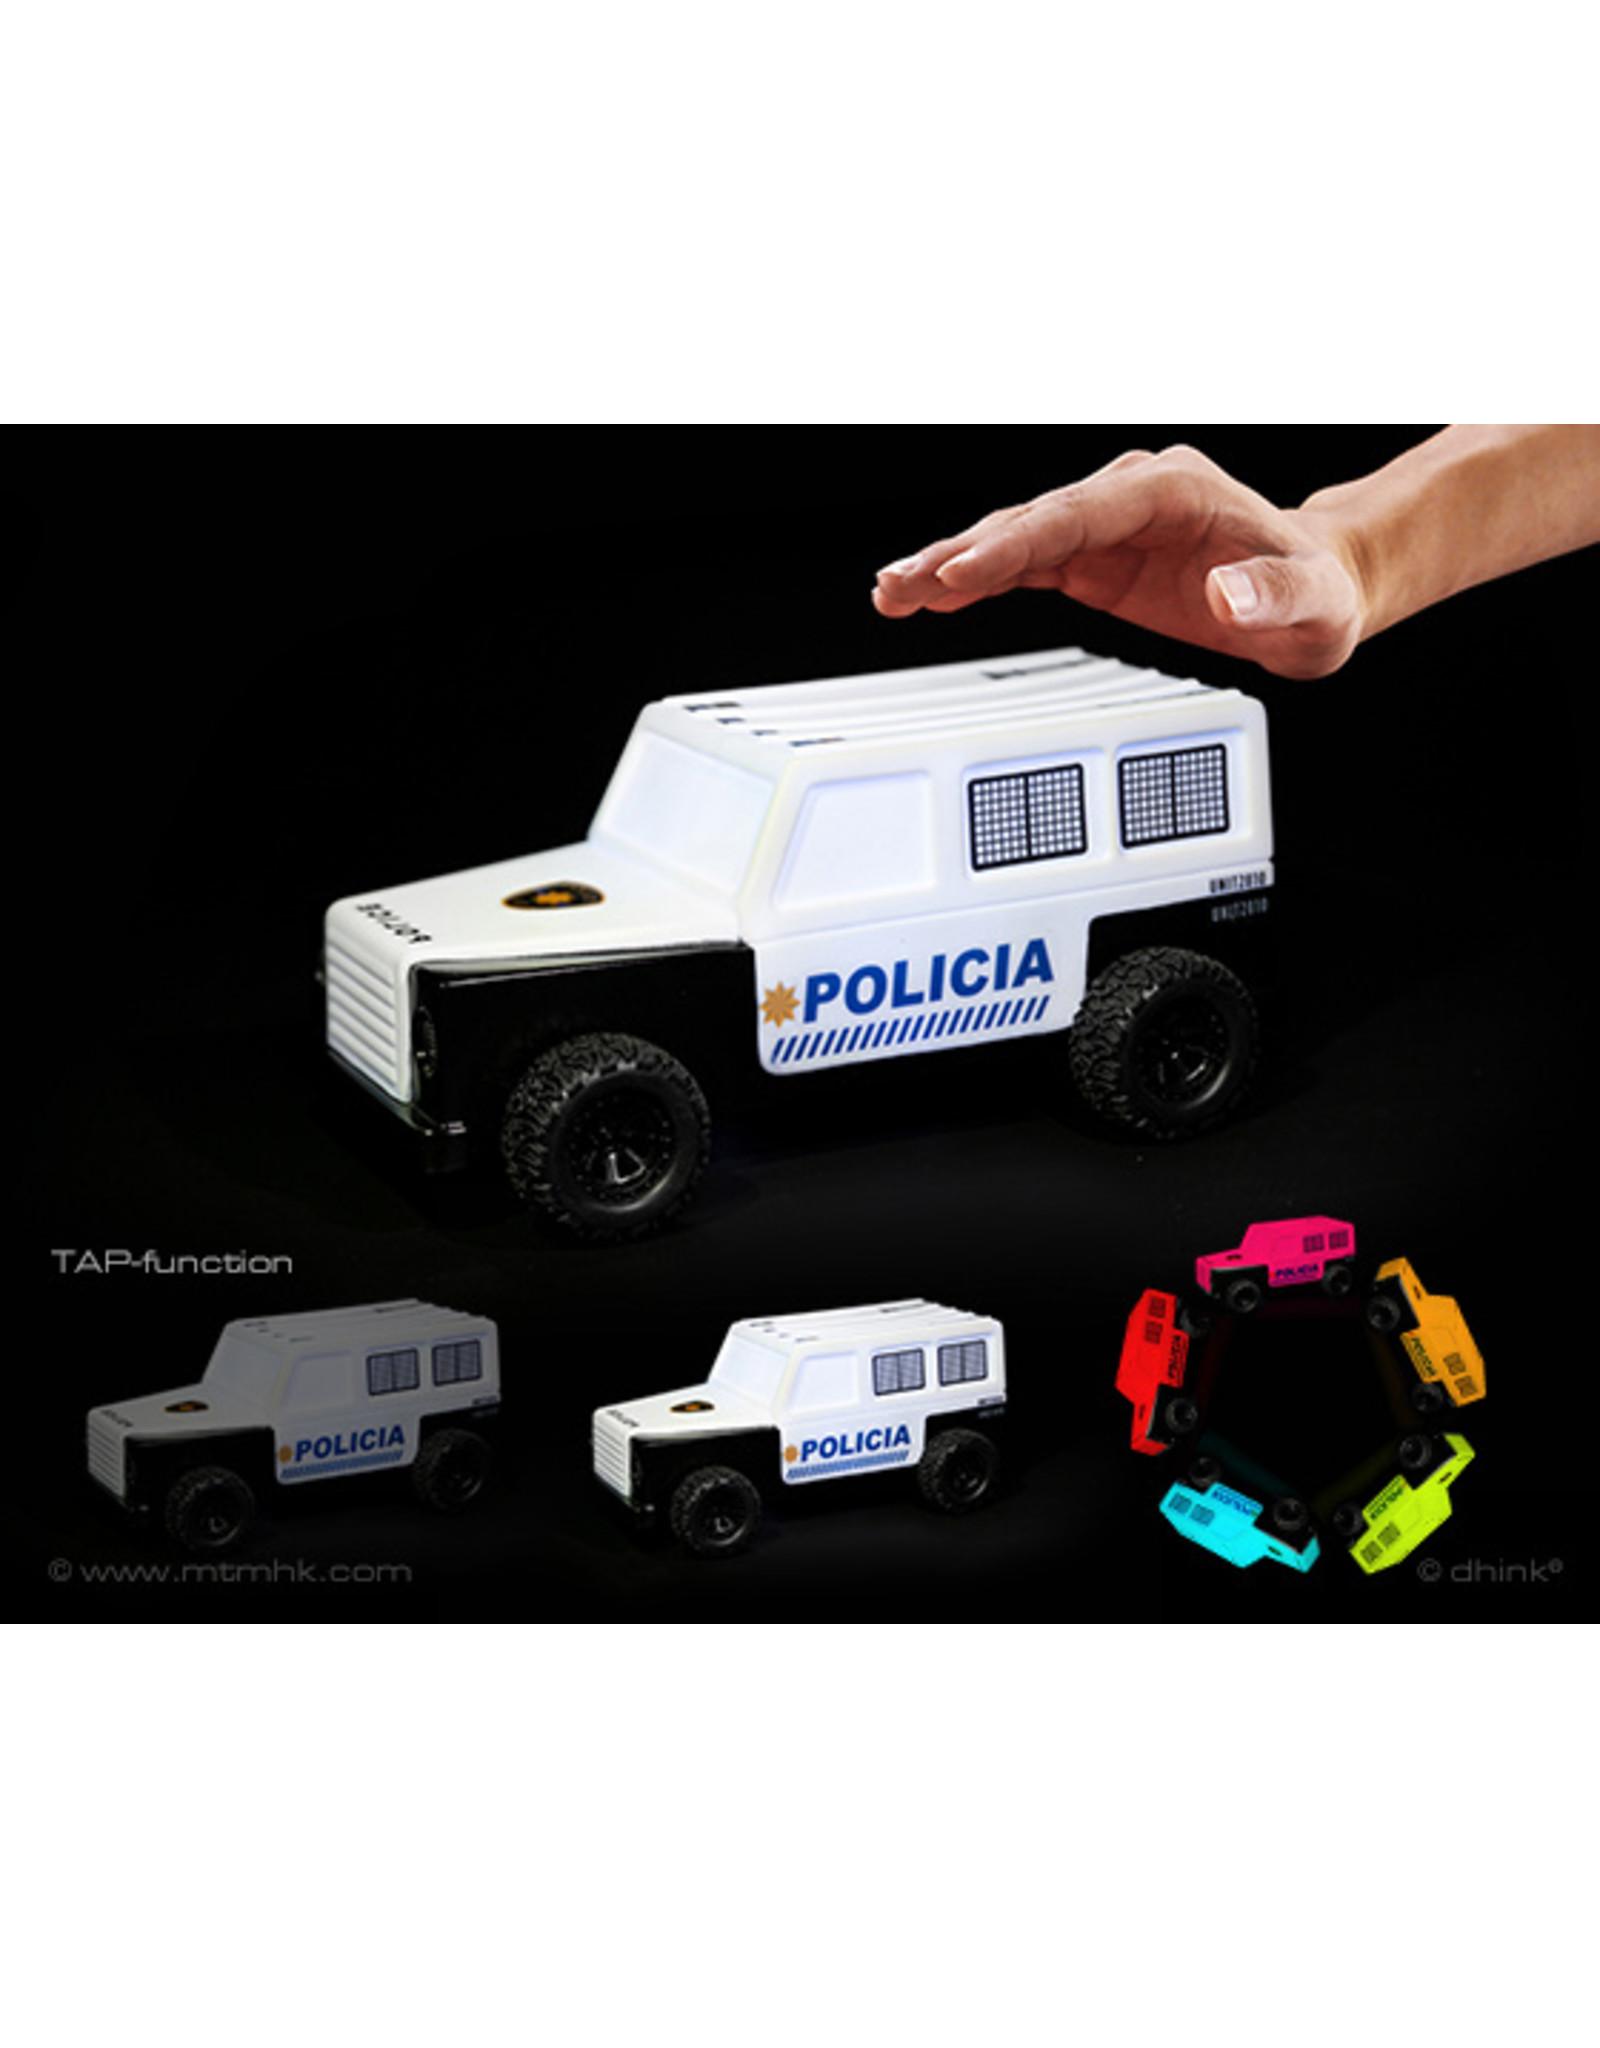 Dhink Dhink - Nightlight (TOY CAR/LIGHT) - Police Department - black/white